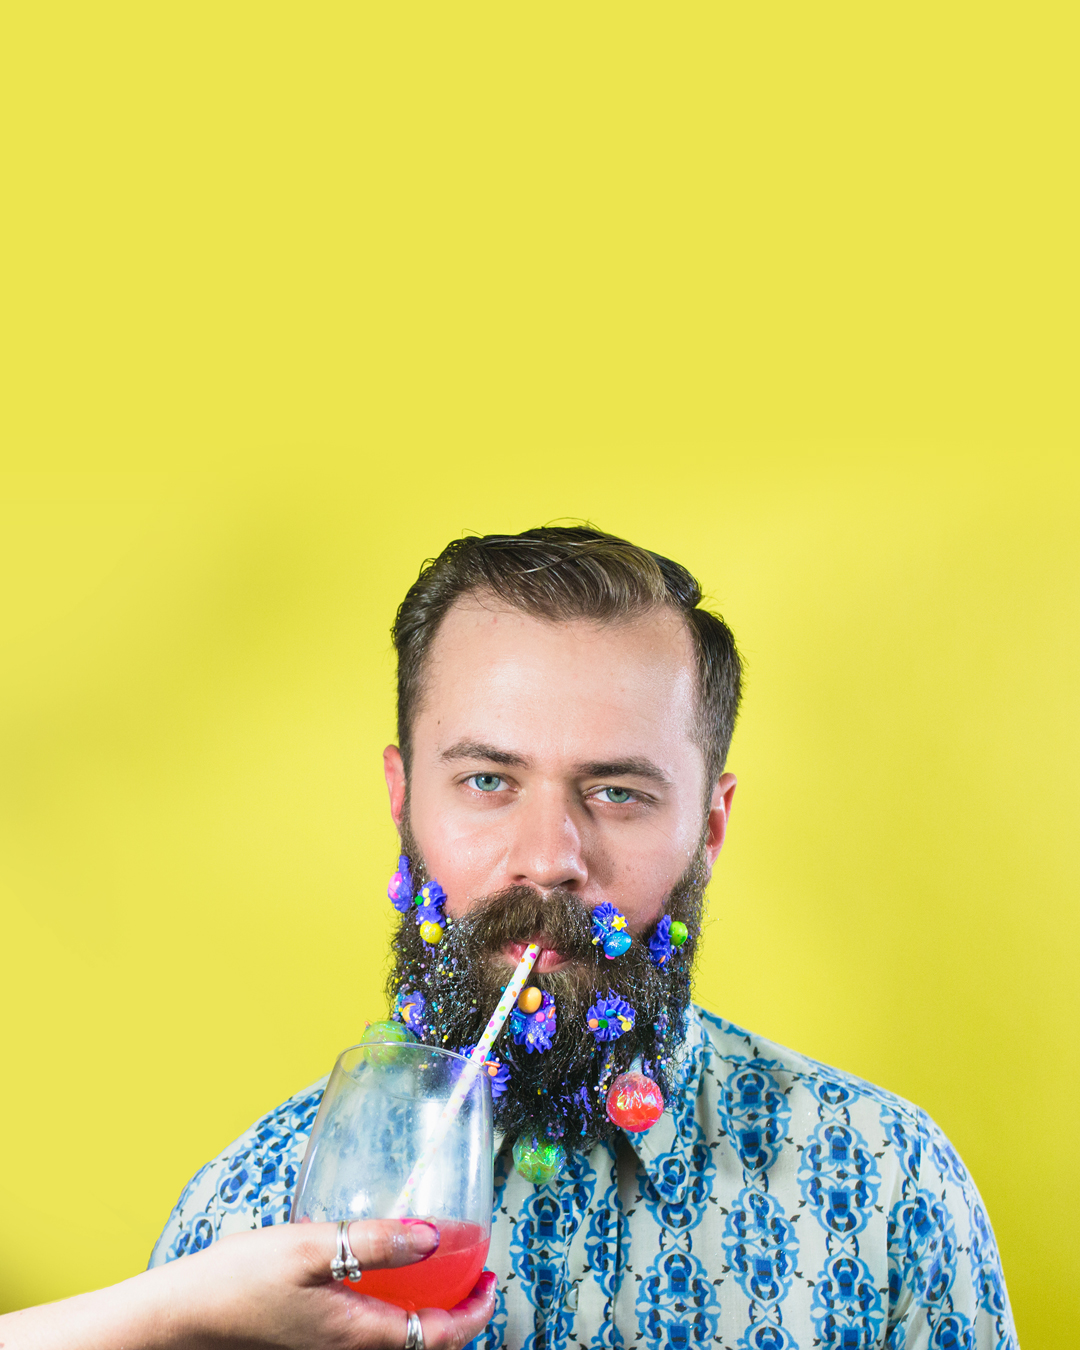 fiesta-beard-insta-post_3.JPG